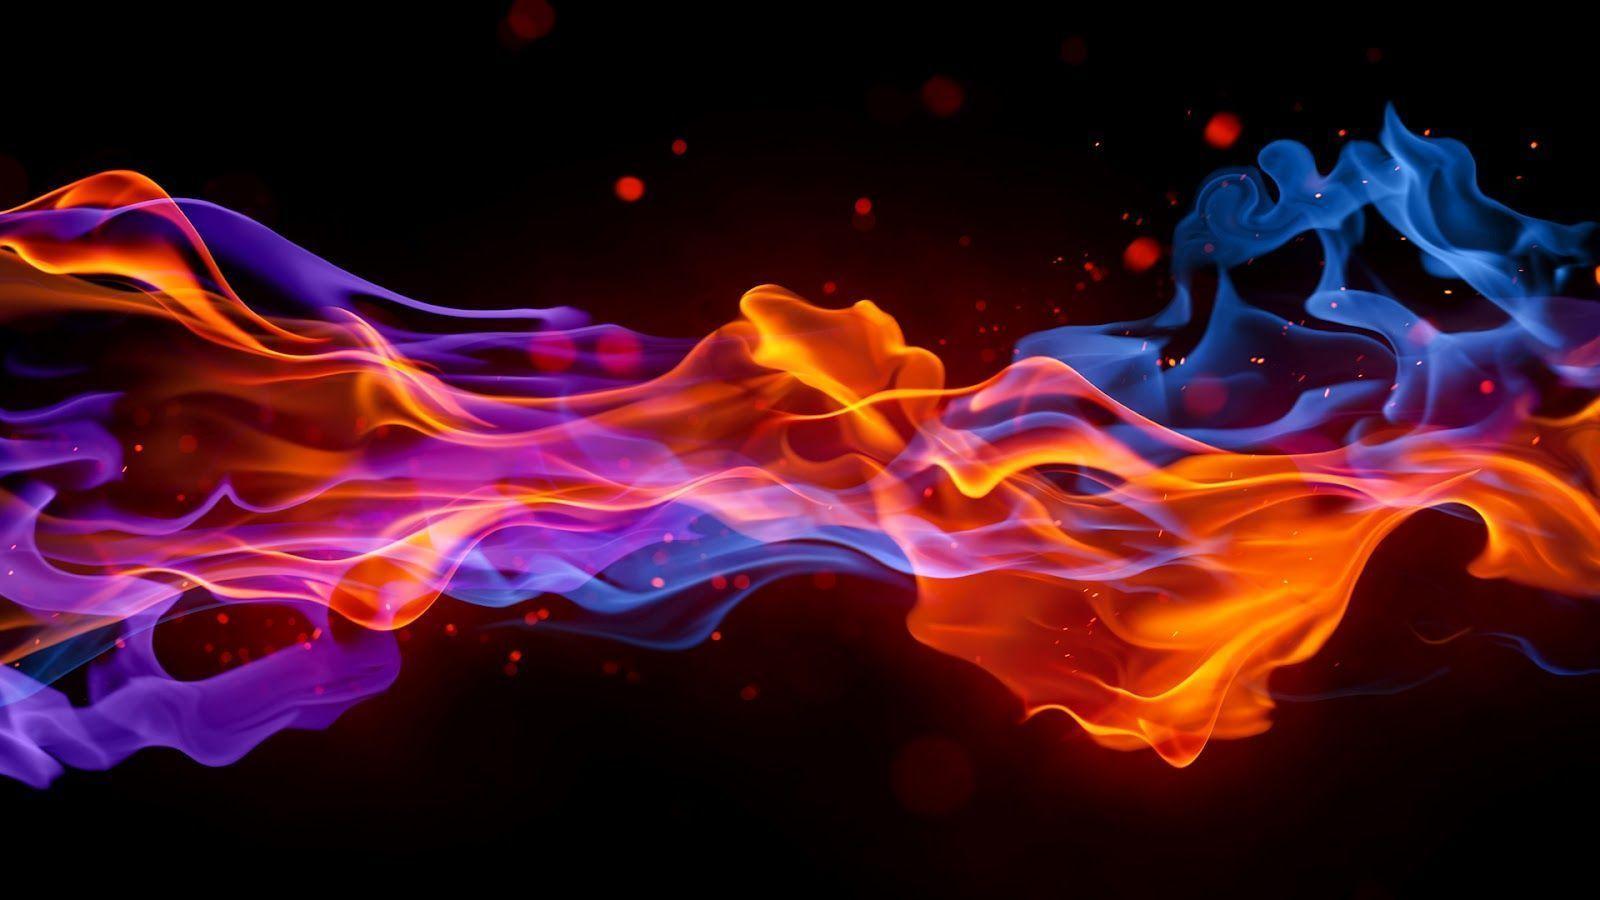 Smoke Wallpapers Top Free Smoke Backgrounds Wallpaperaccess